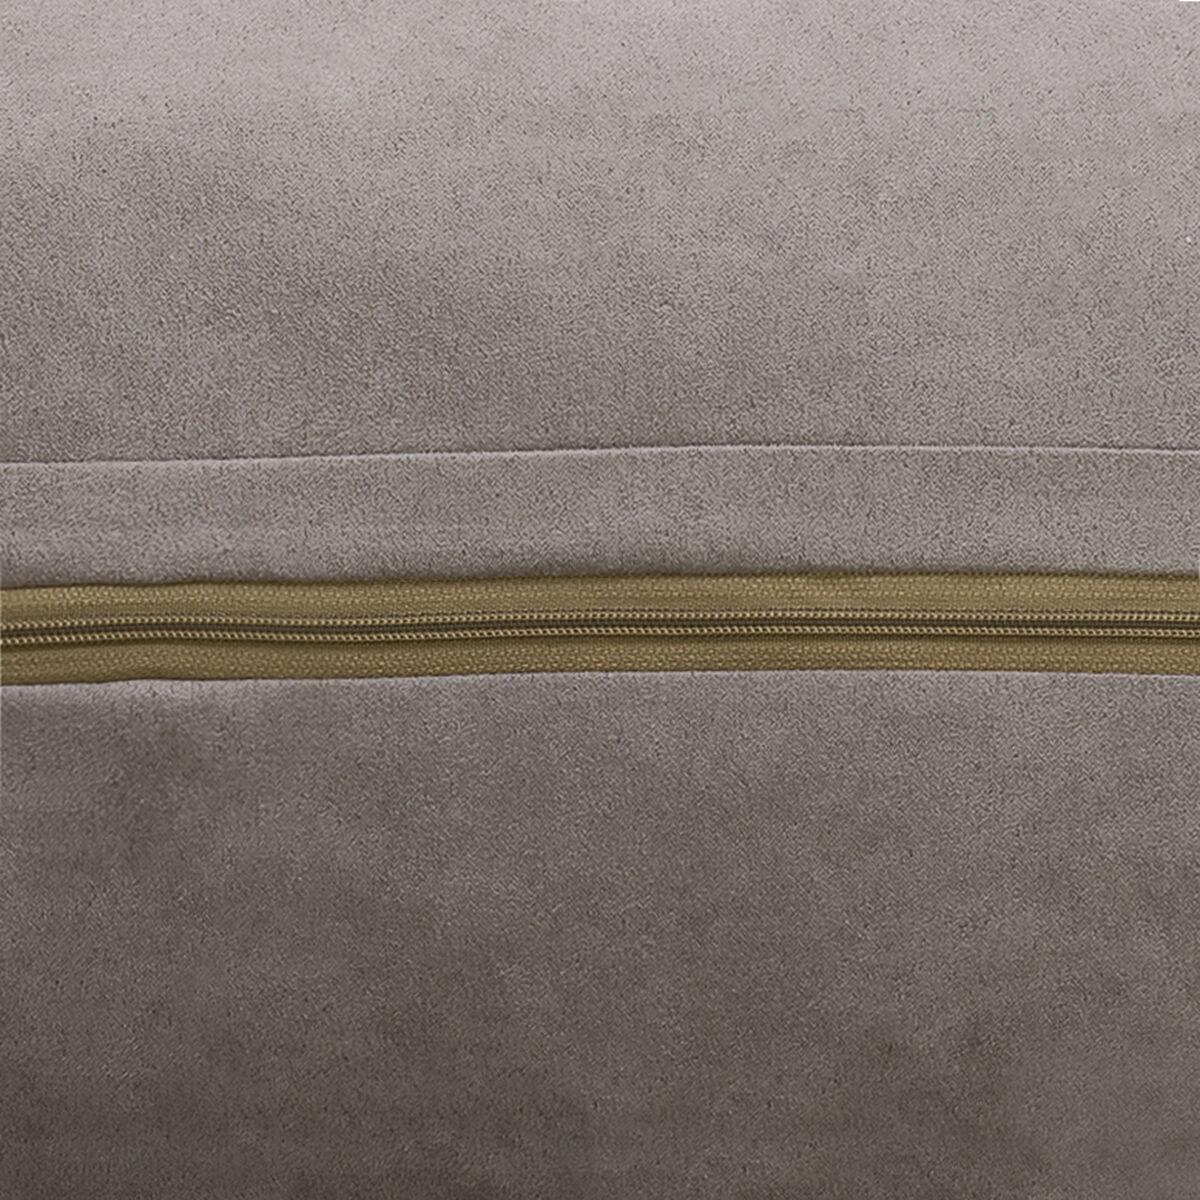 Cojín de Lentejuelas Zibel Lisa 45X45 cm